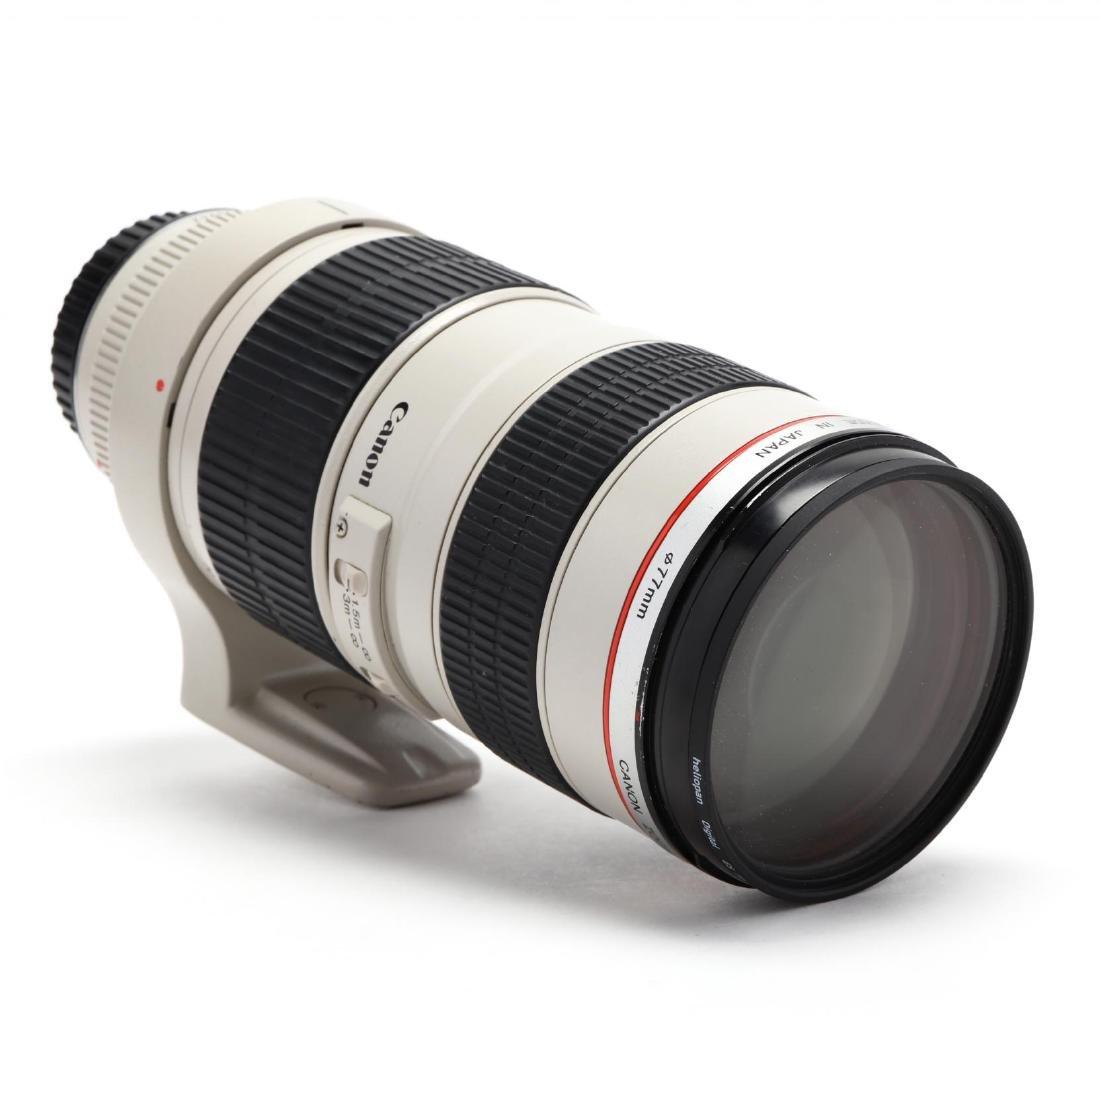 Canon 70-200mm Camera Lens - 4